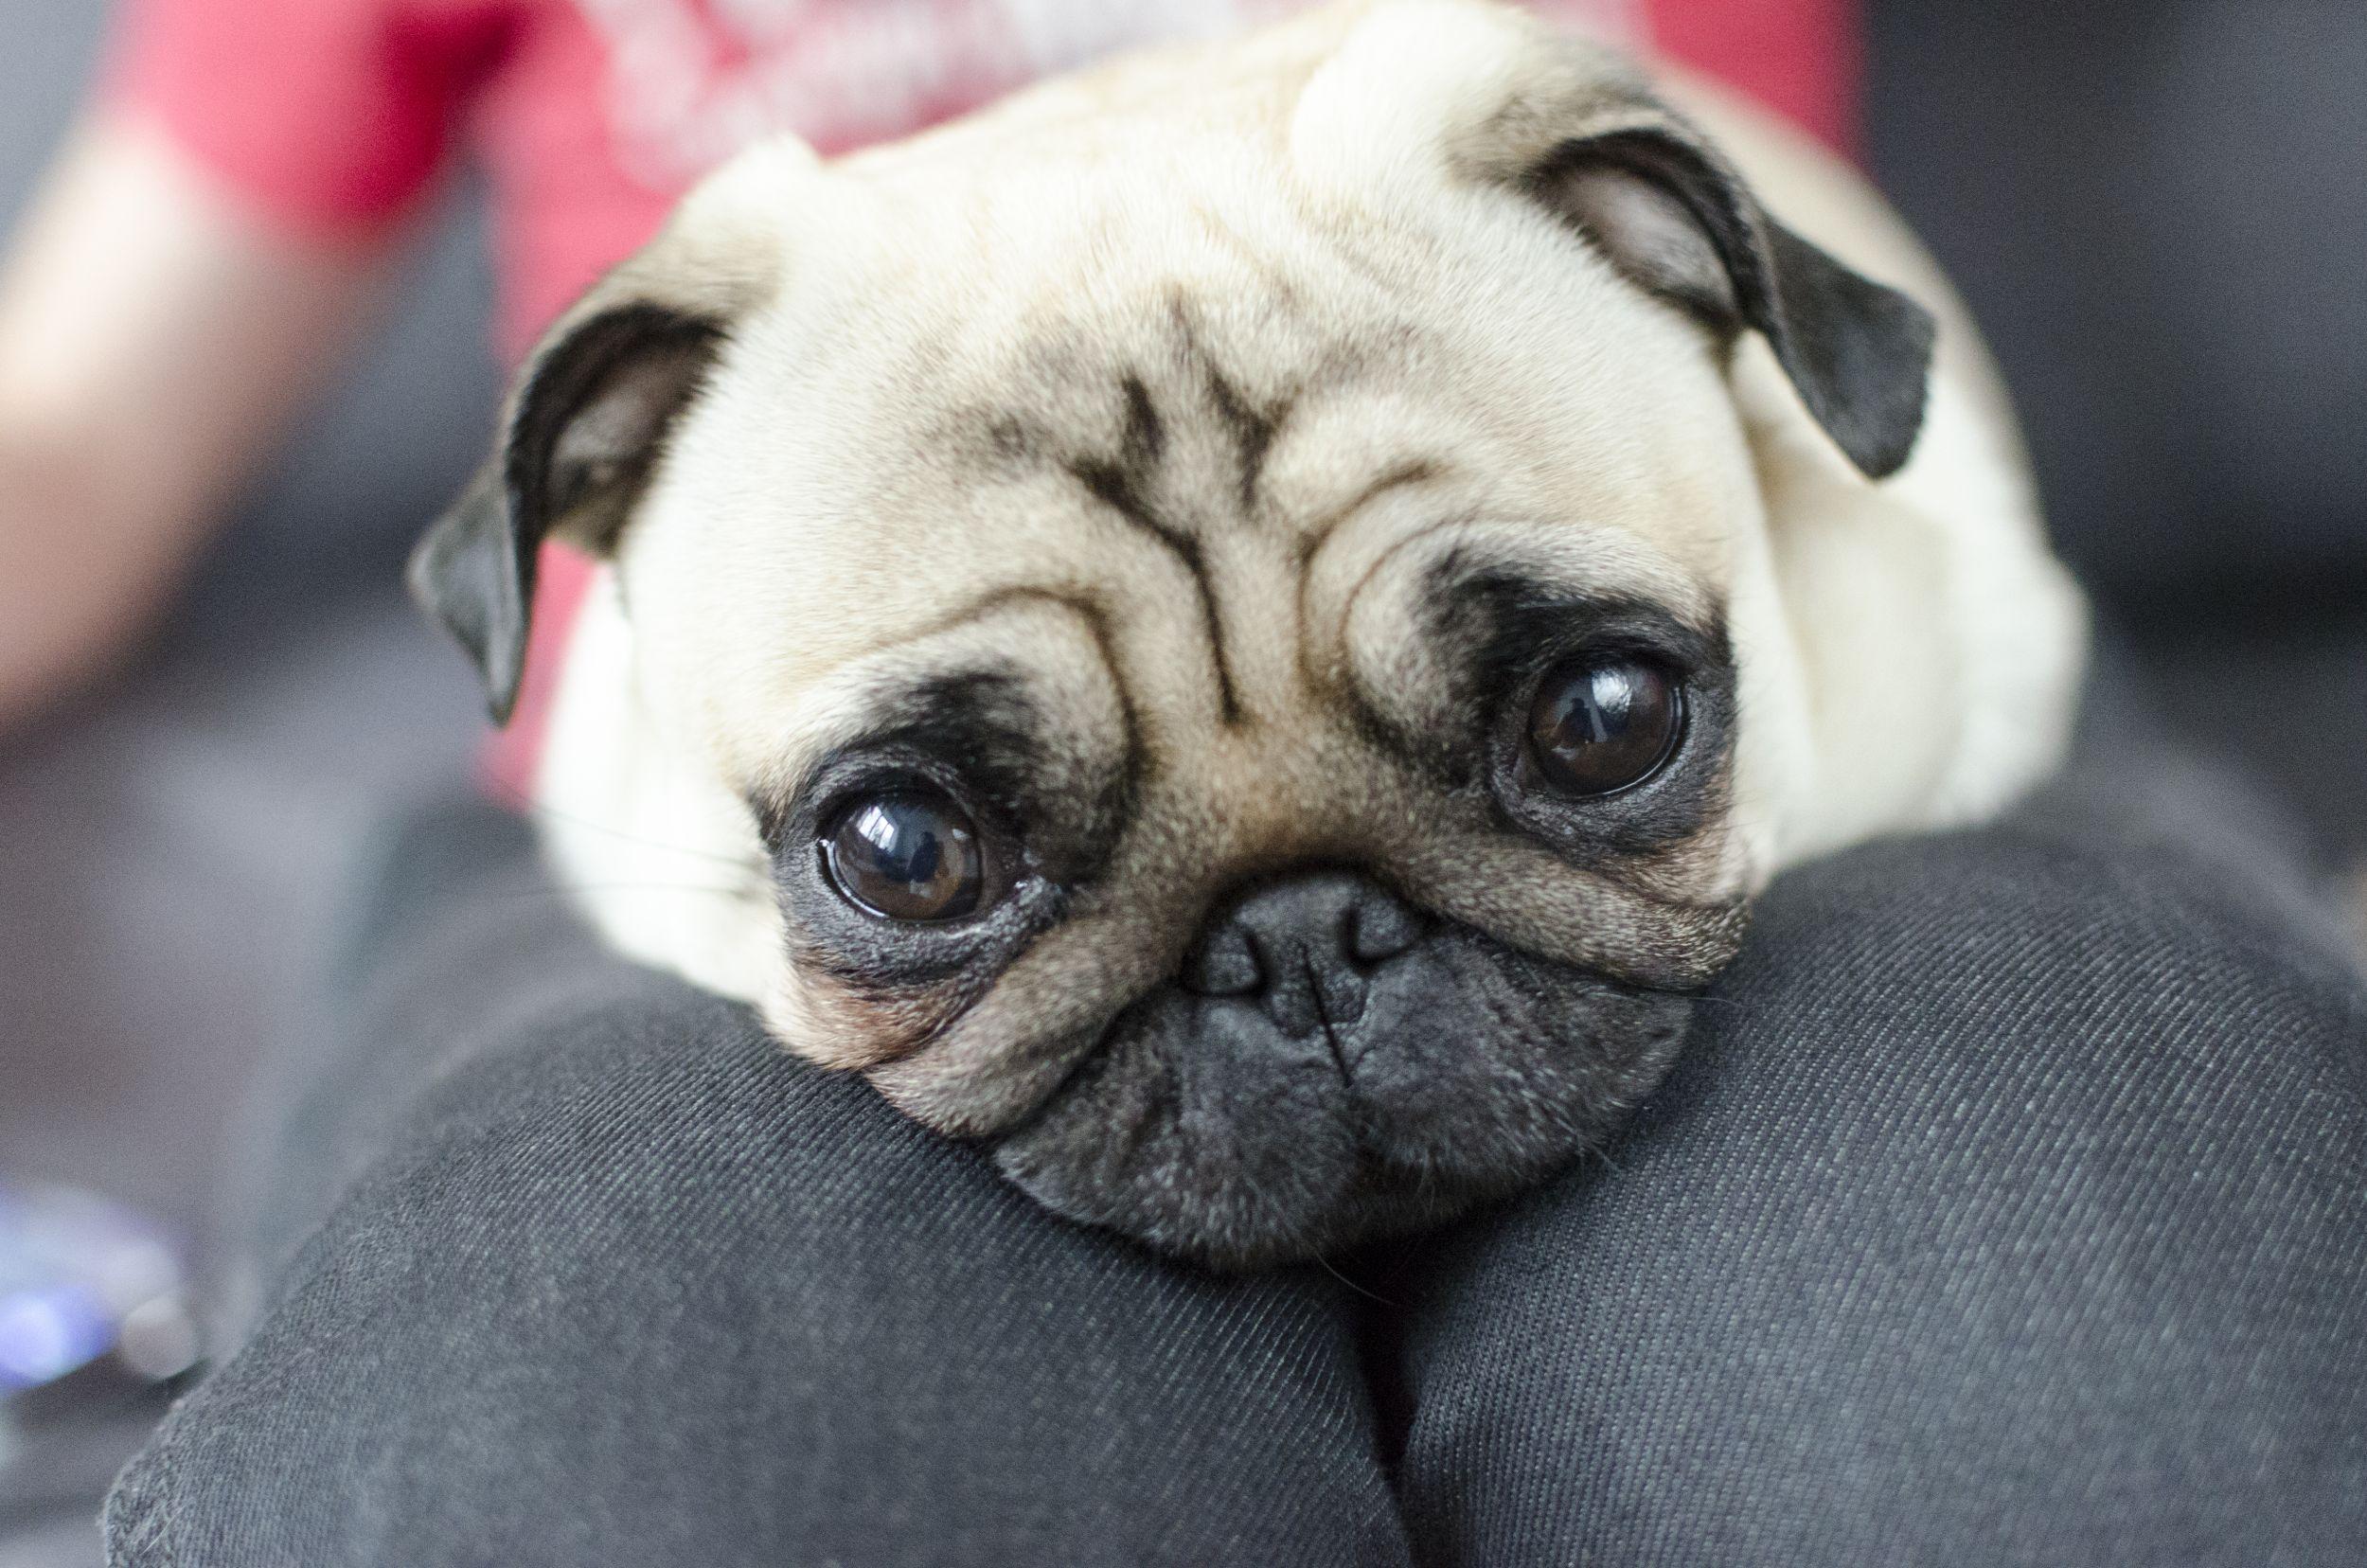 Dogilike.com :: รู้ทันน้องหมาจอมโกหก ... หลอกทีไร เจ้าของเชื่อทุกที!